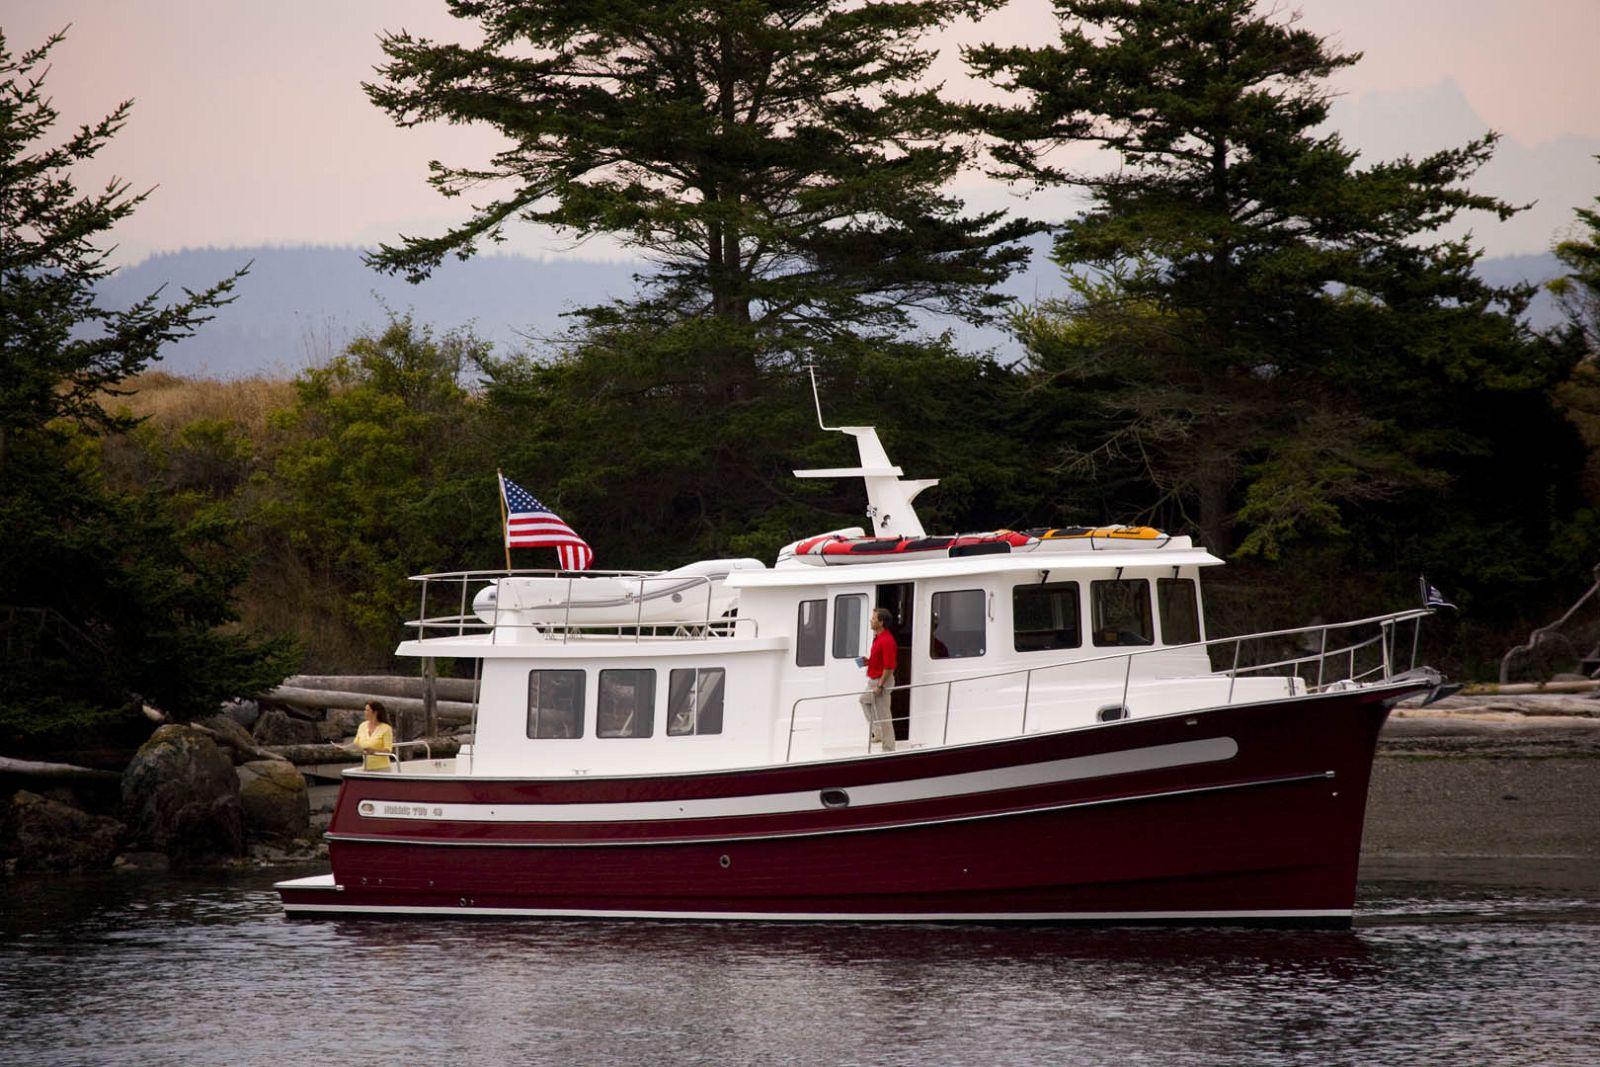 Nordic Tugs 49 Boat